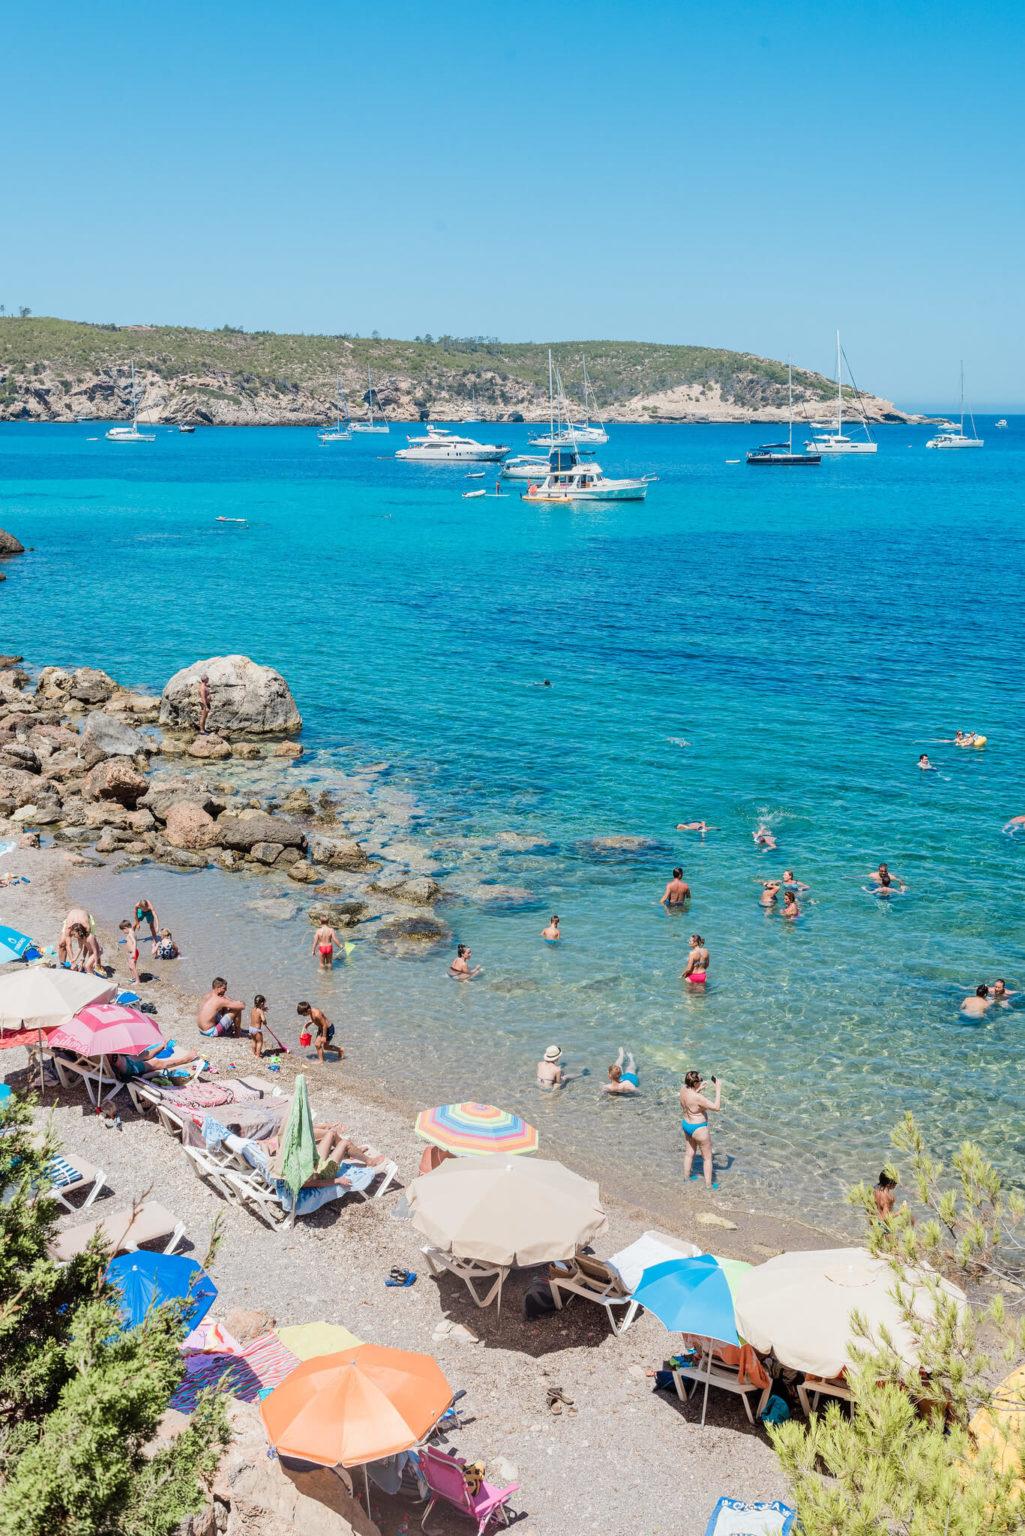 https://www.white-ibiza.com/wp-content/uploads/2020/03/ibiza-beaches-sillot-des-rencli-05-1025x1536.jpg